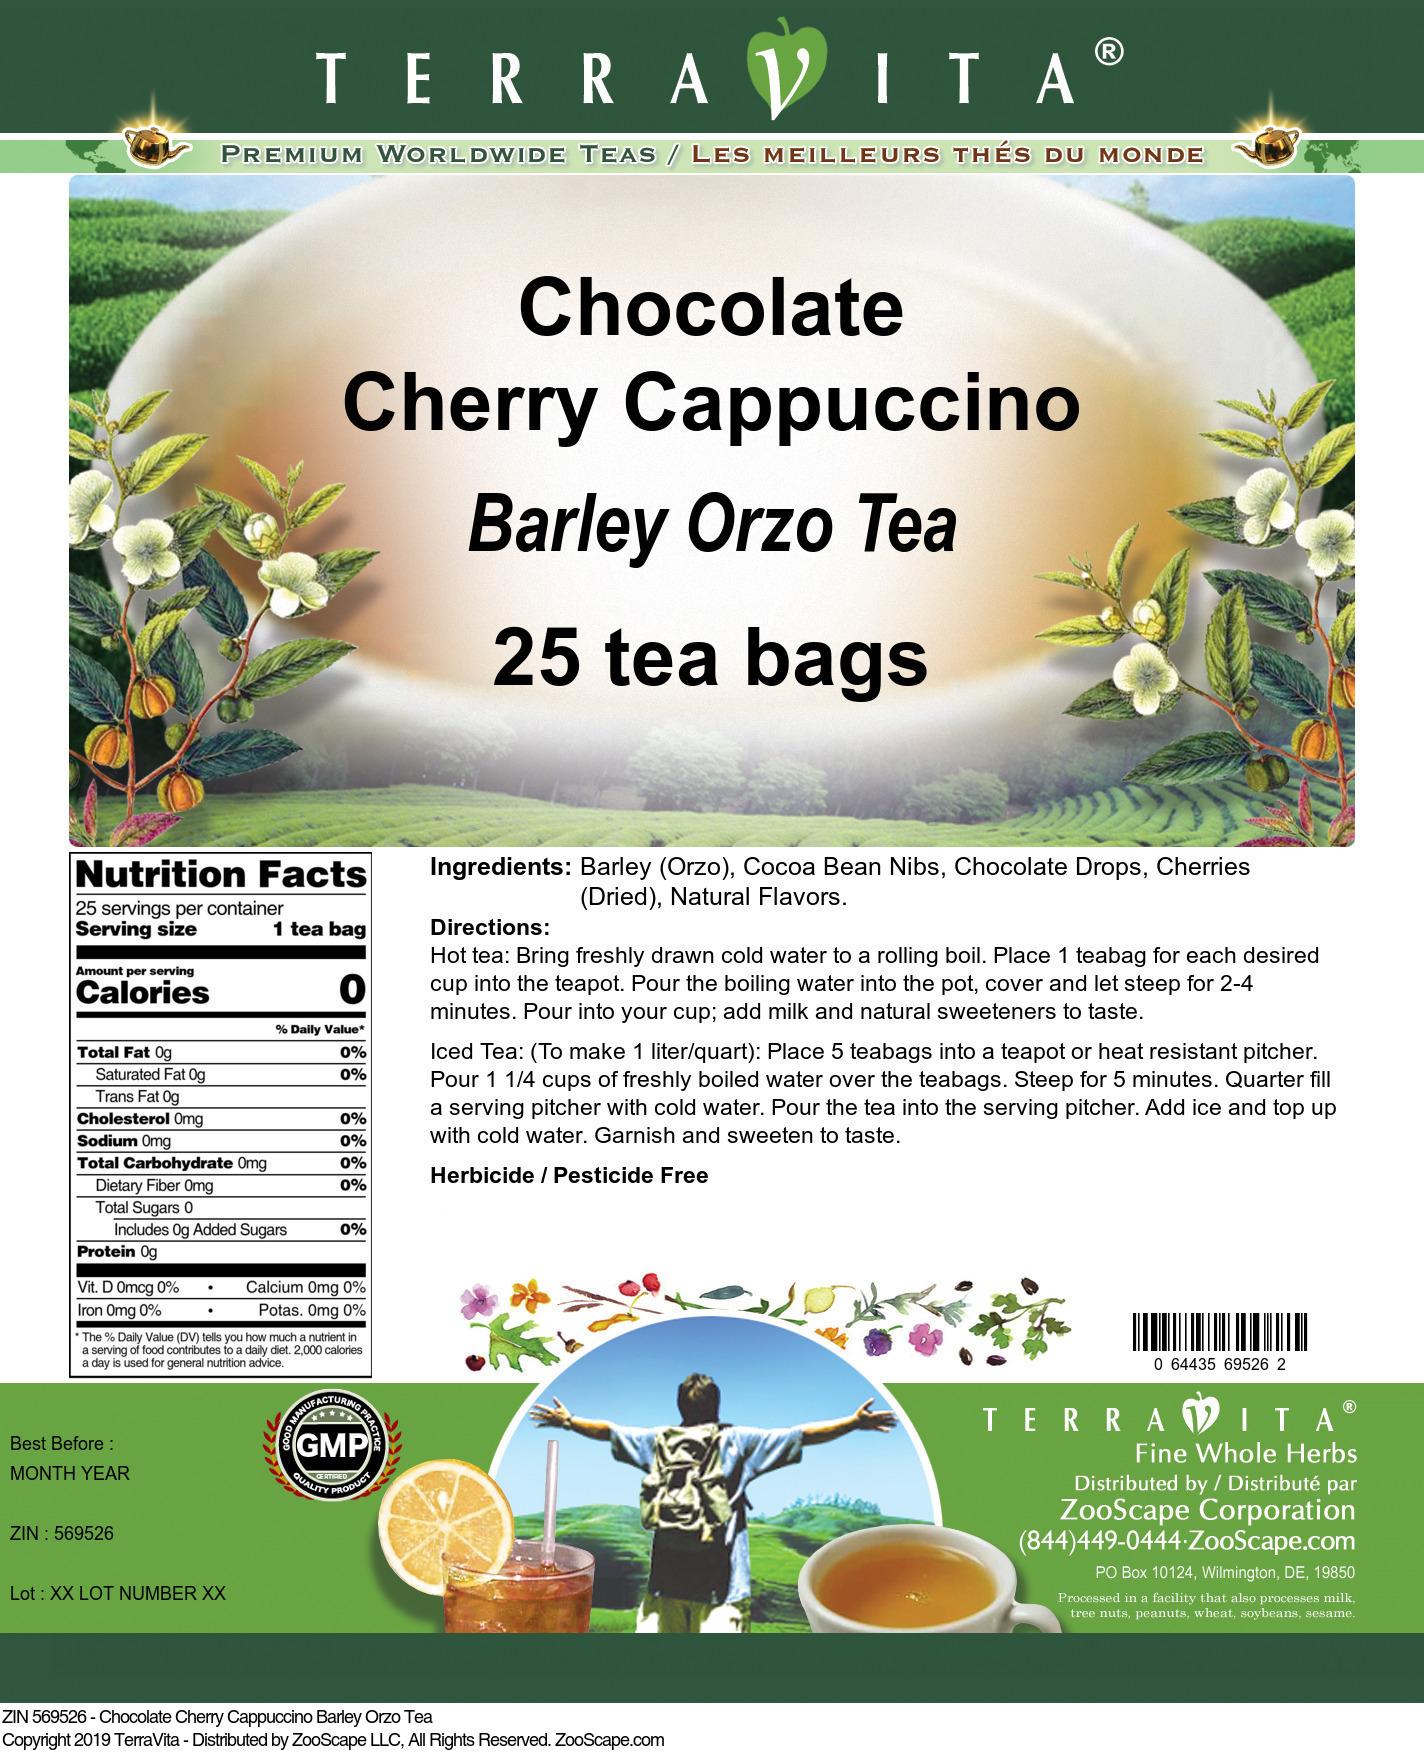 Chocolate Cherry Cappuccino Barley Orzo Tea